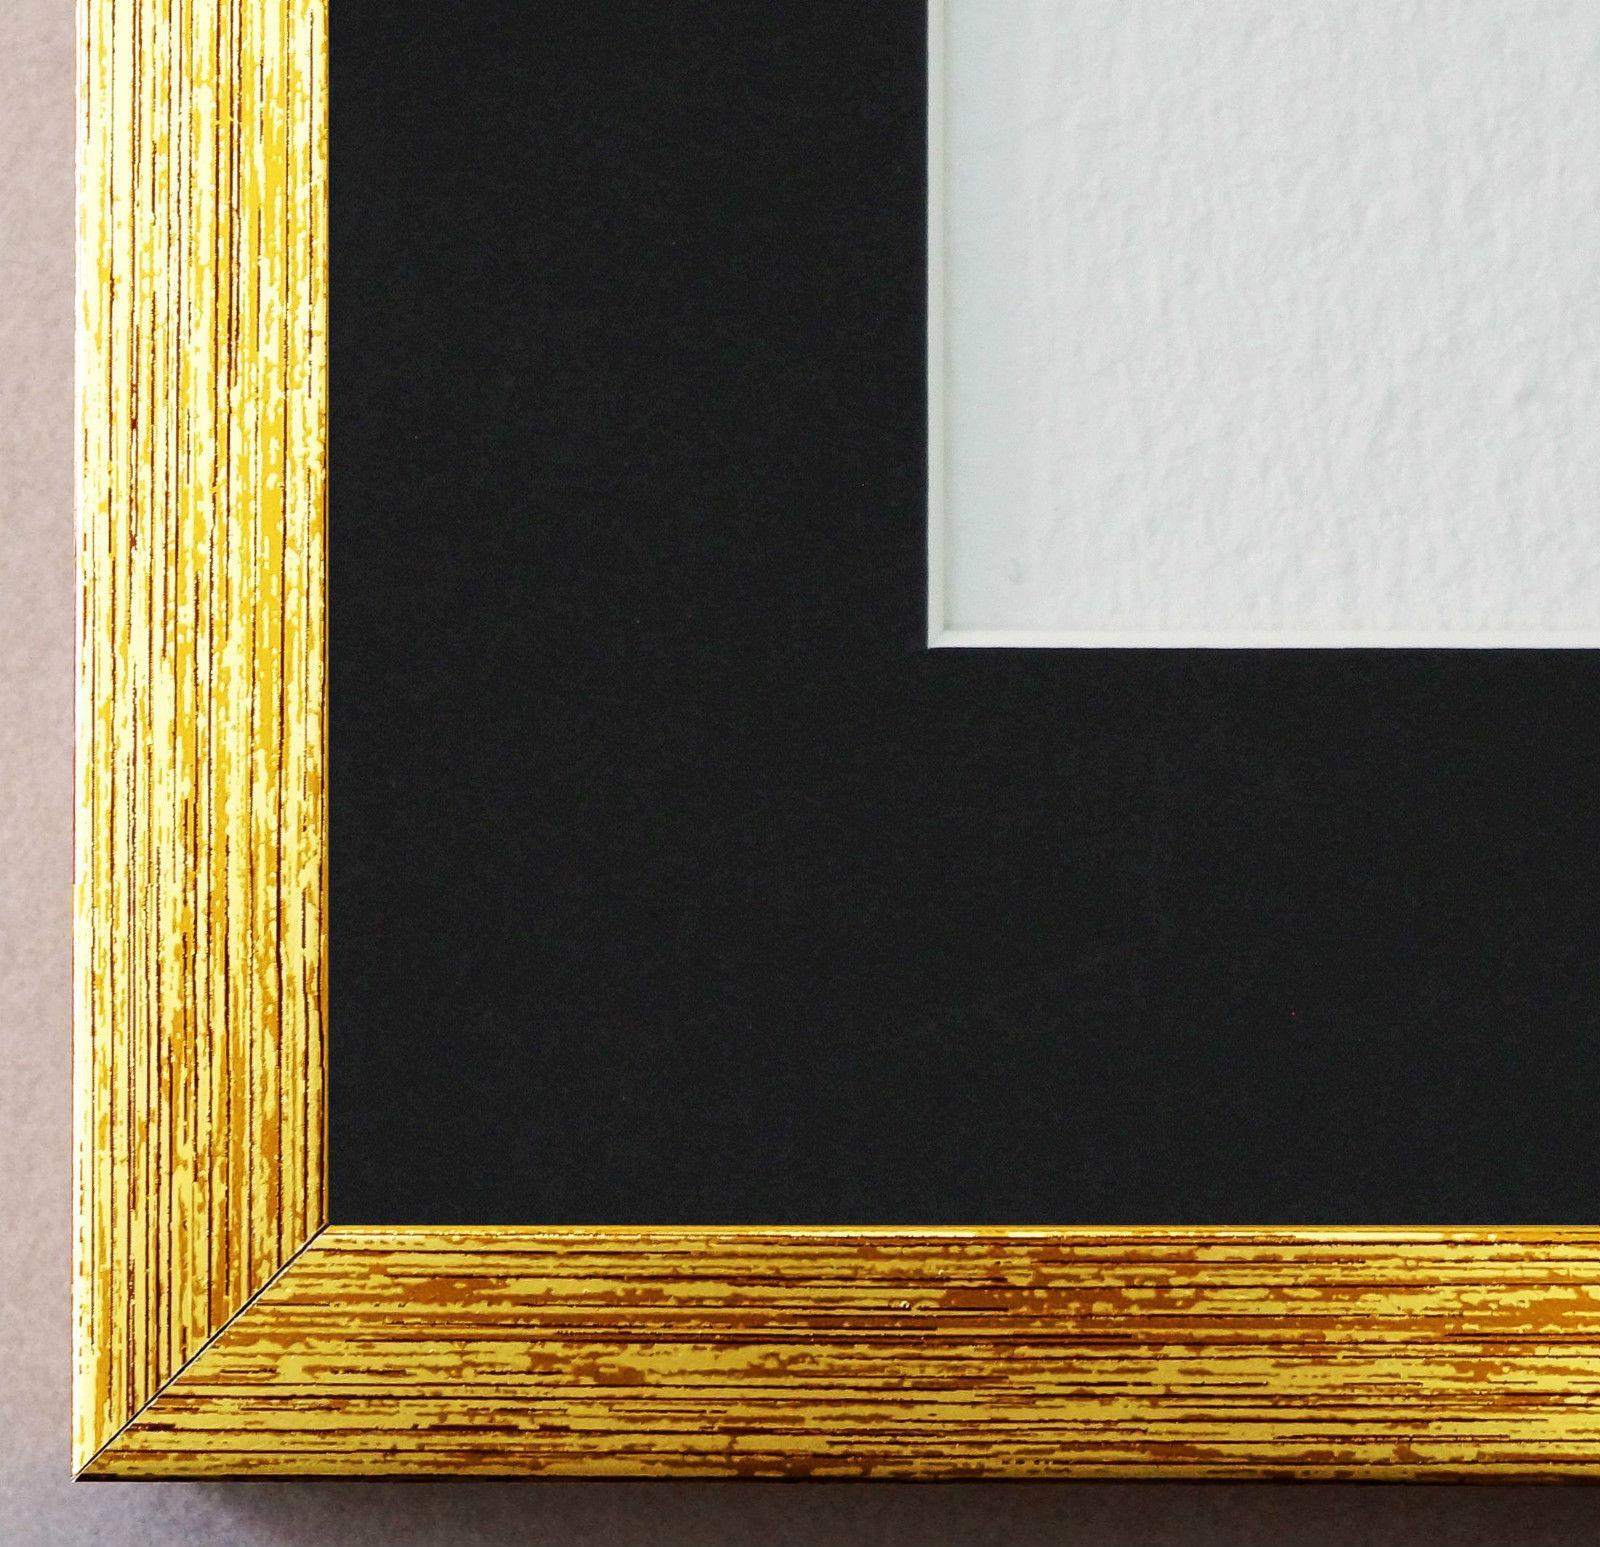 Bilderrahmen Como in Gold struk. mit Passepartout in Schwarz 2, 0 ...